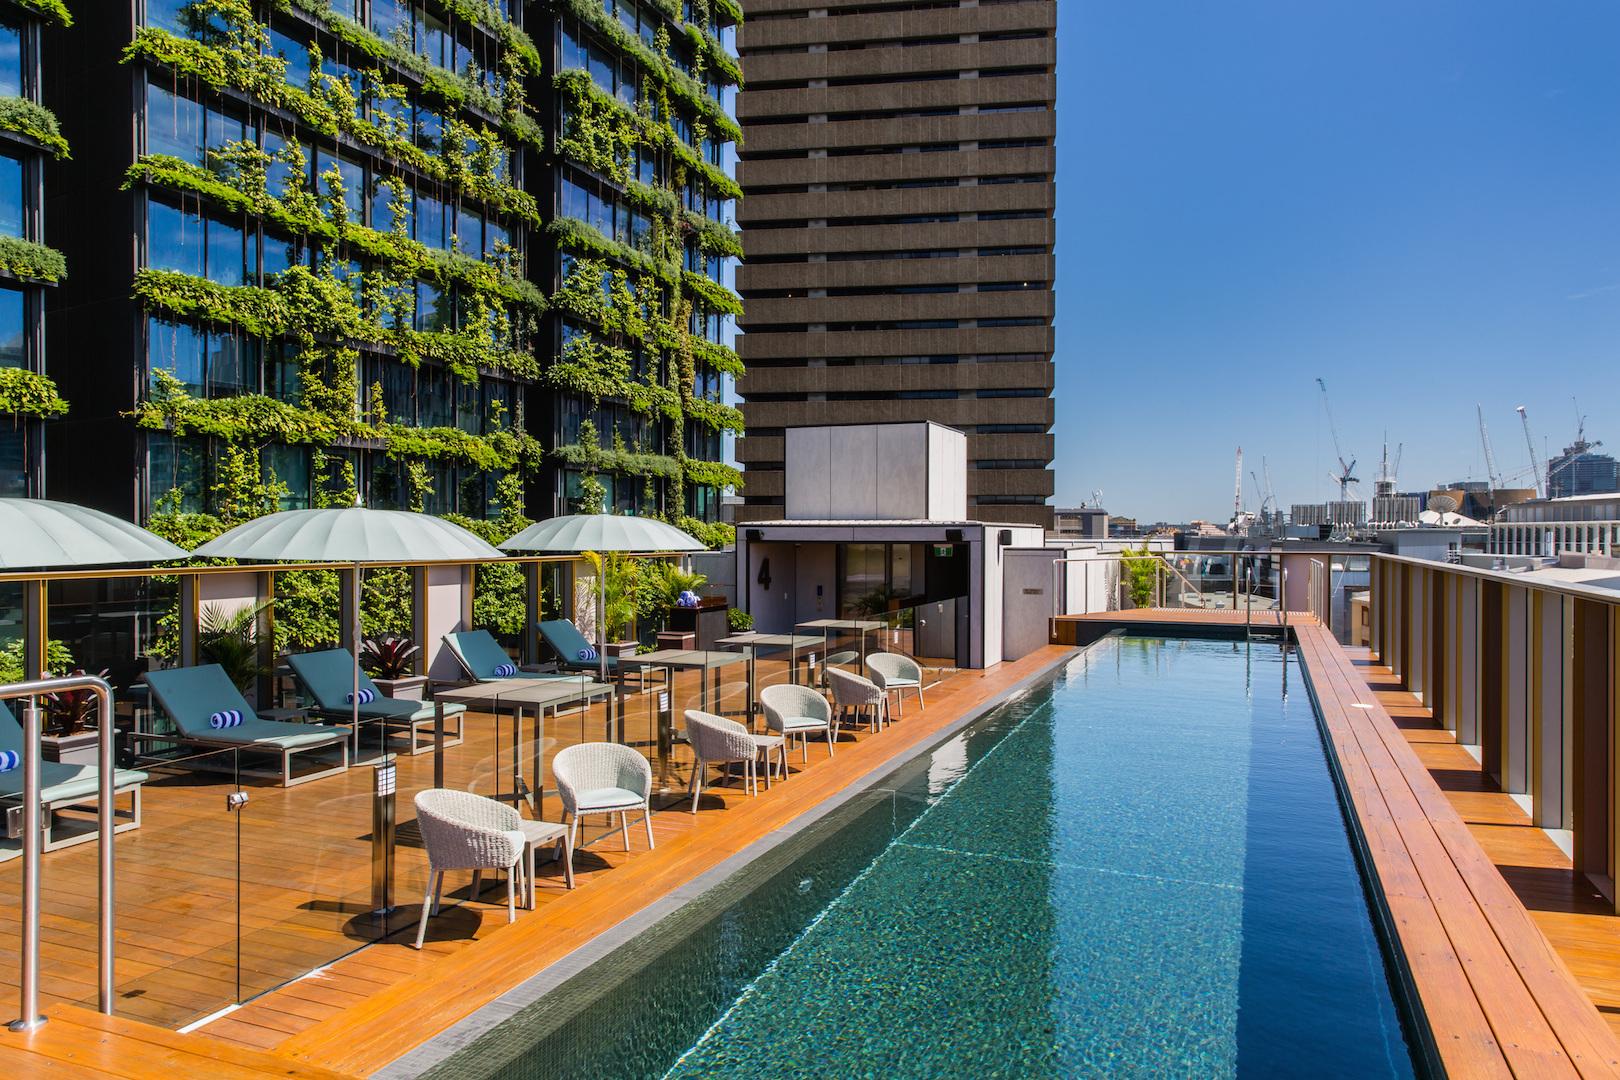 EN4A1894_NikkiTo+Rooftop+Pool+and+Bar+-+UTS+and+city+views_landscape.jpg